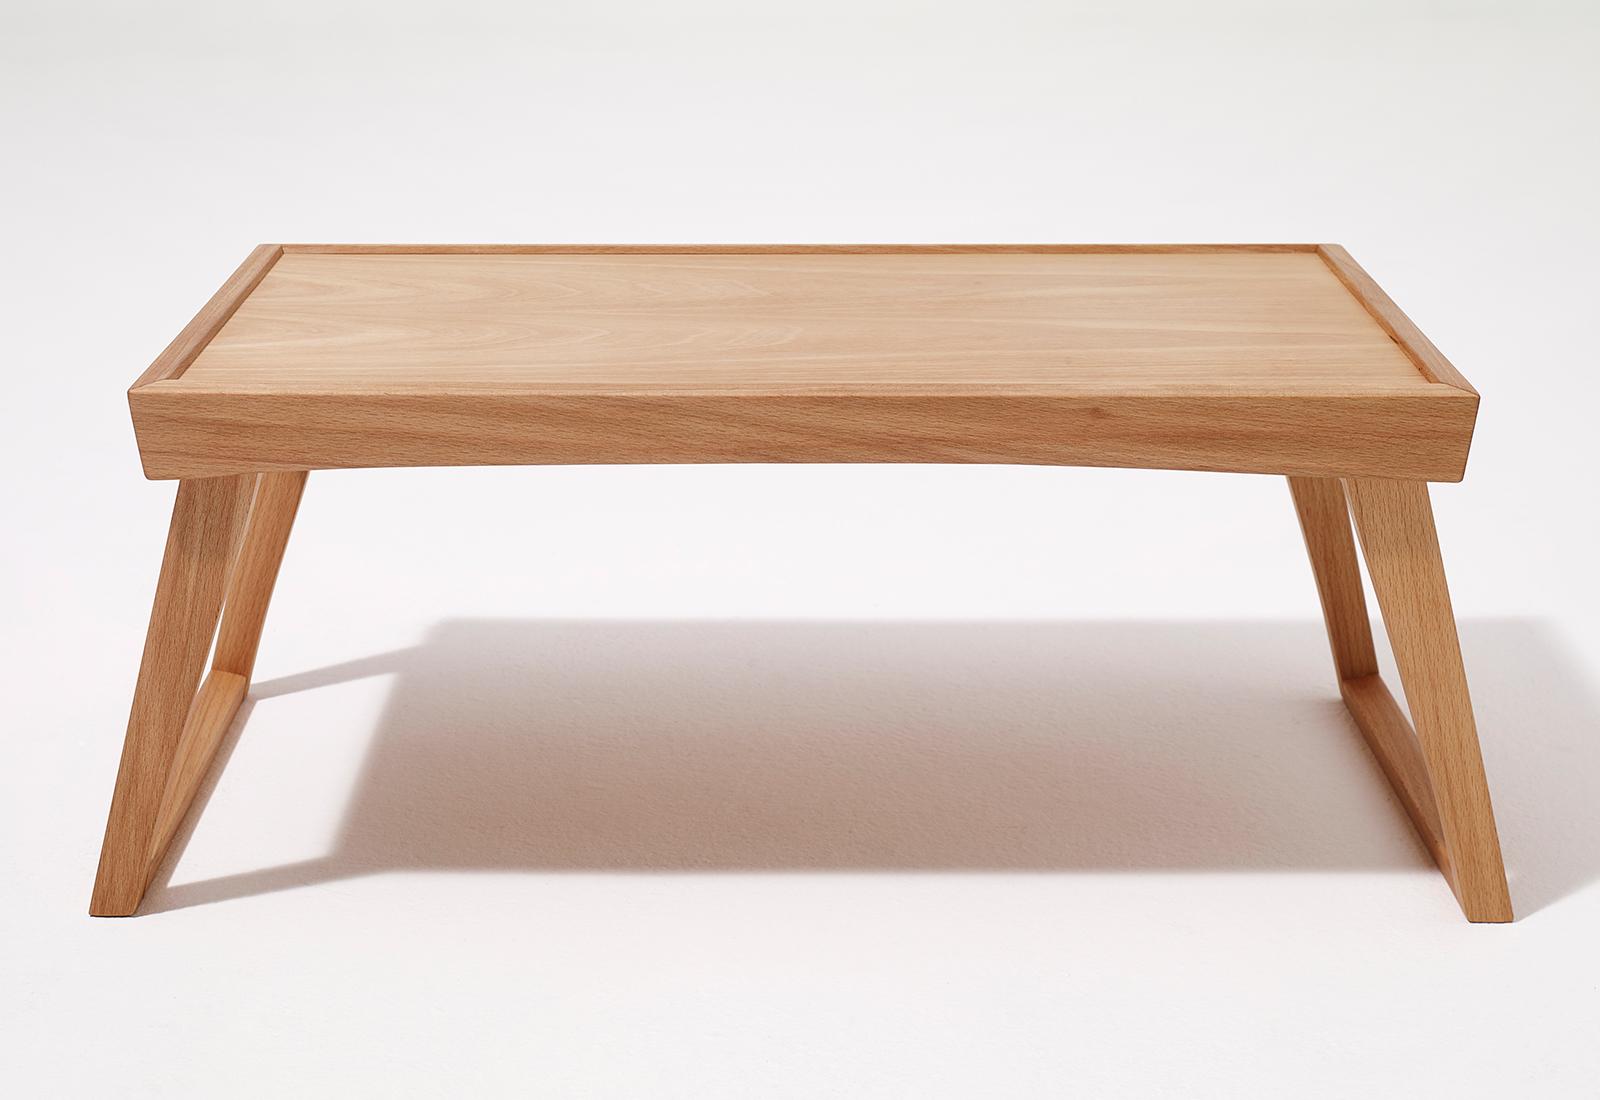 d sir e fr hst ckstablett serviertablett klappbar bett tisch tablett holz tablett bett. Black Bedroom Furniture Sets. Home Design Ideas